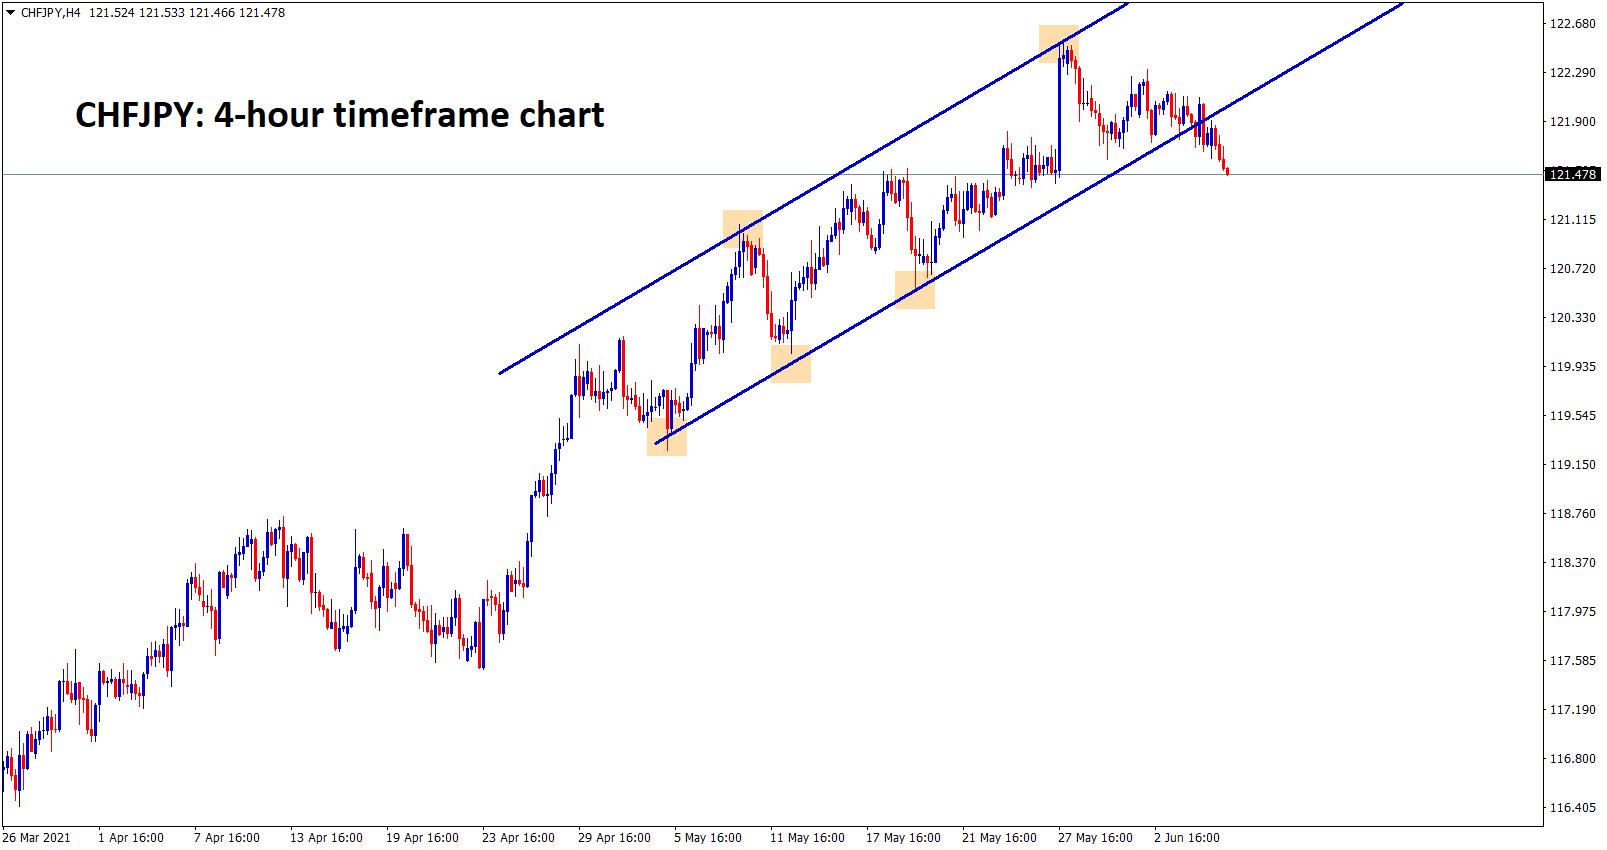 CHFJPY break the higher low of the Uptrend line